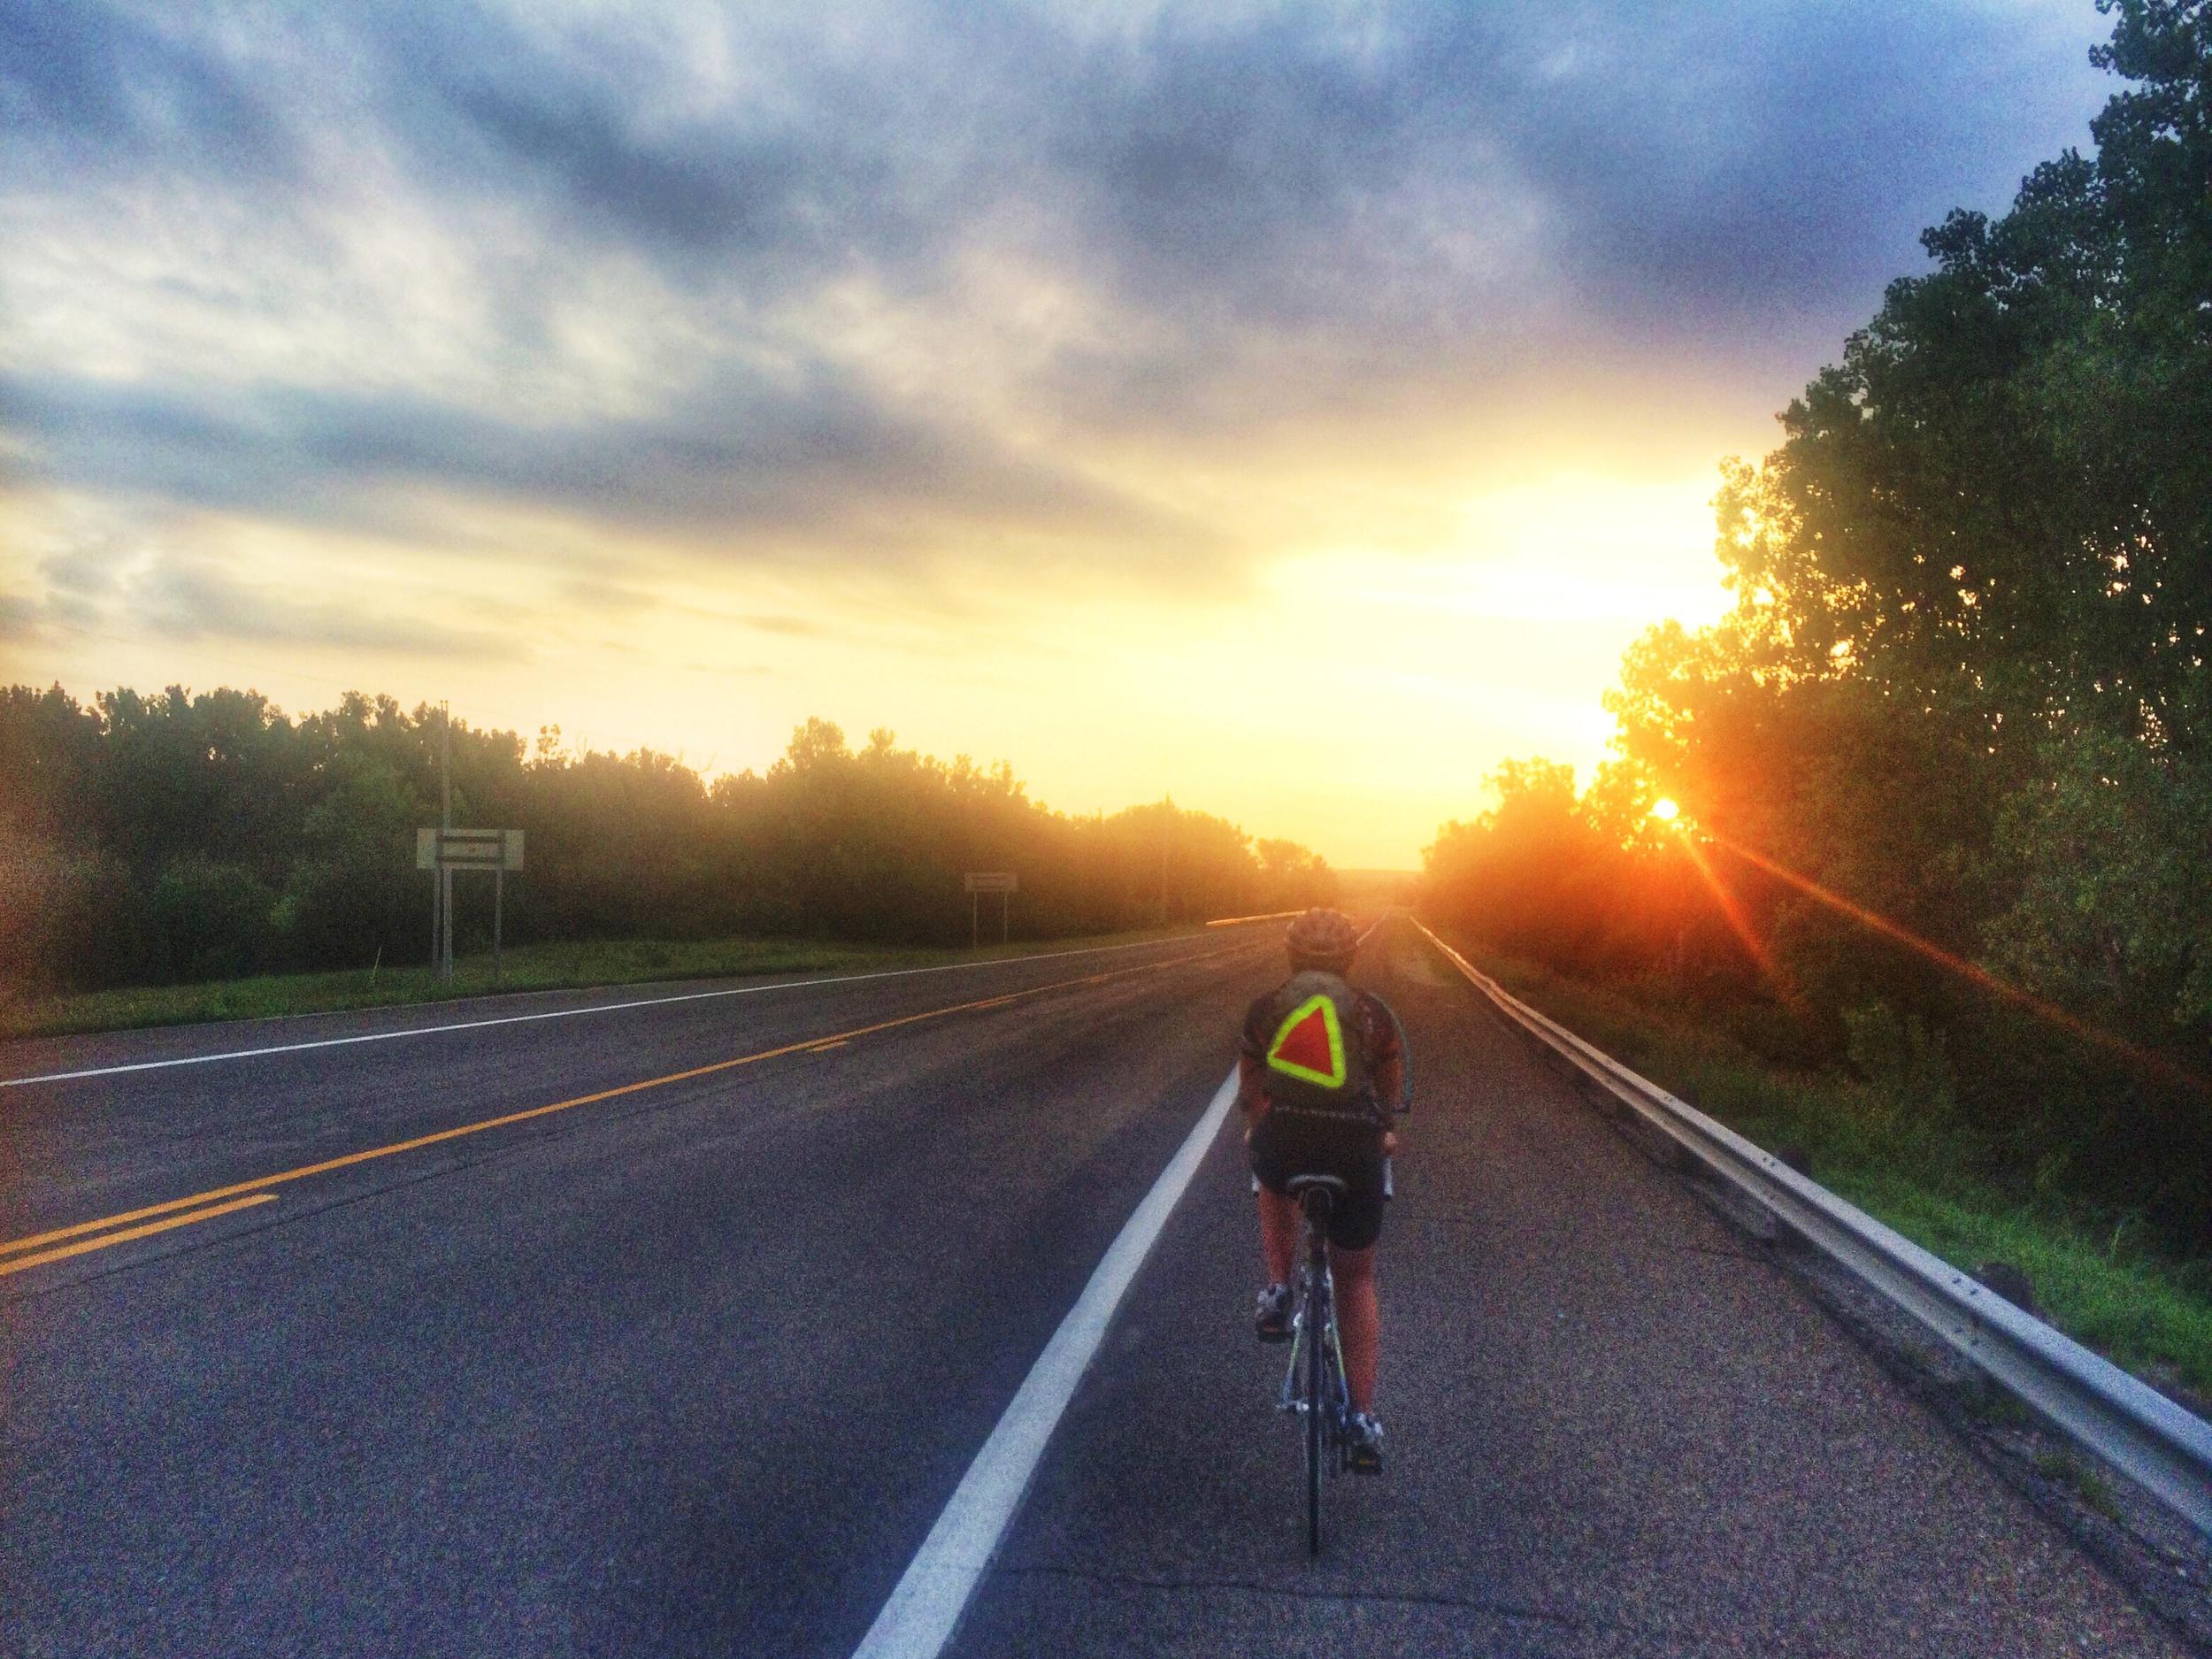 Kansas had the most beautiful sunrises